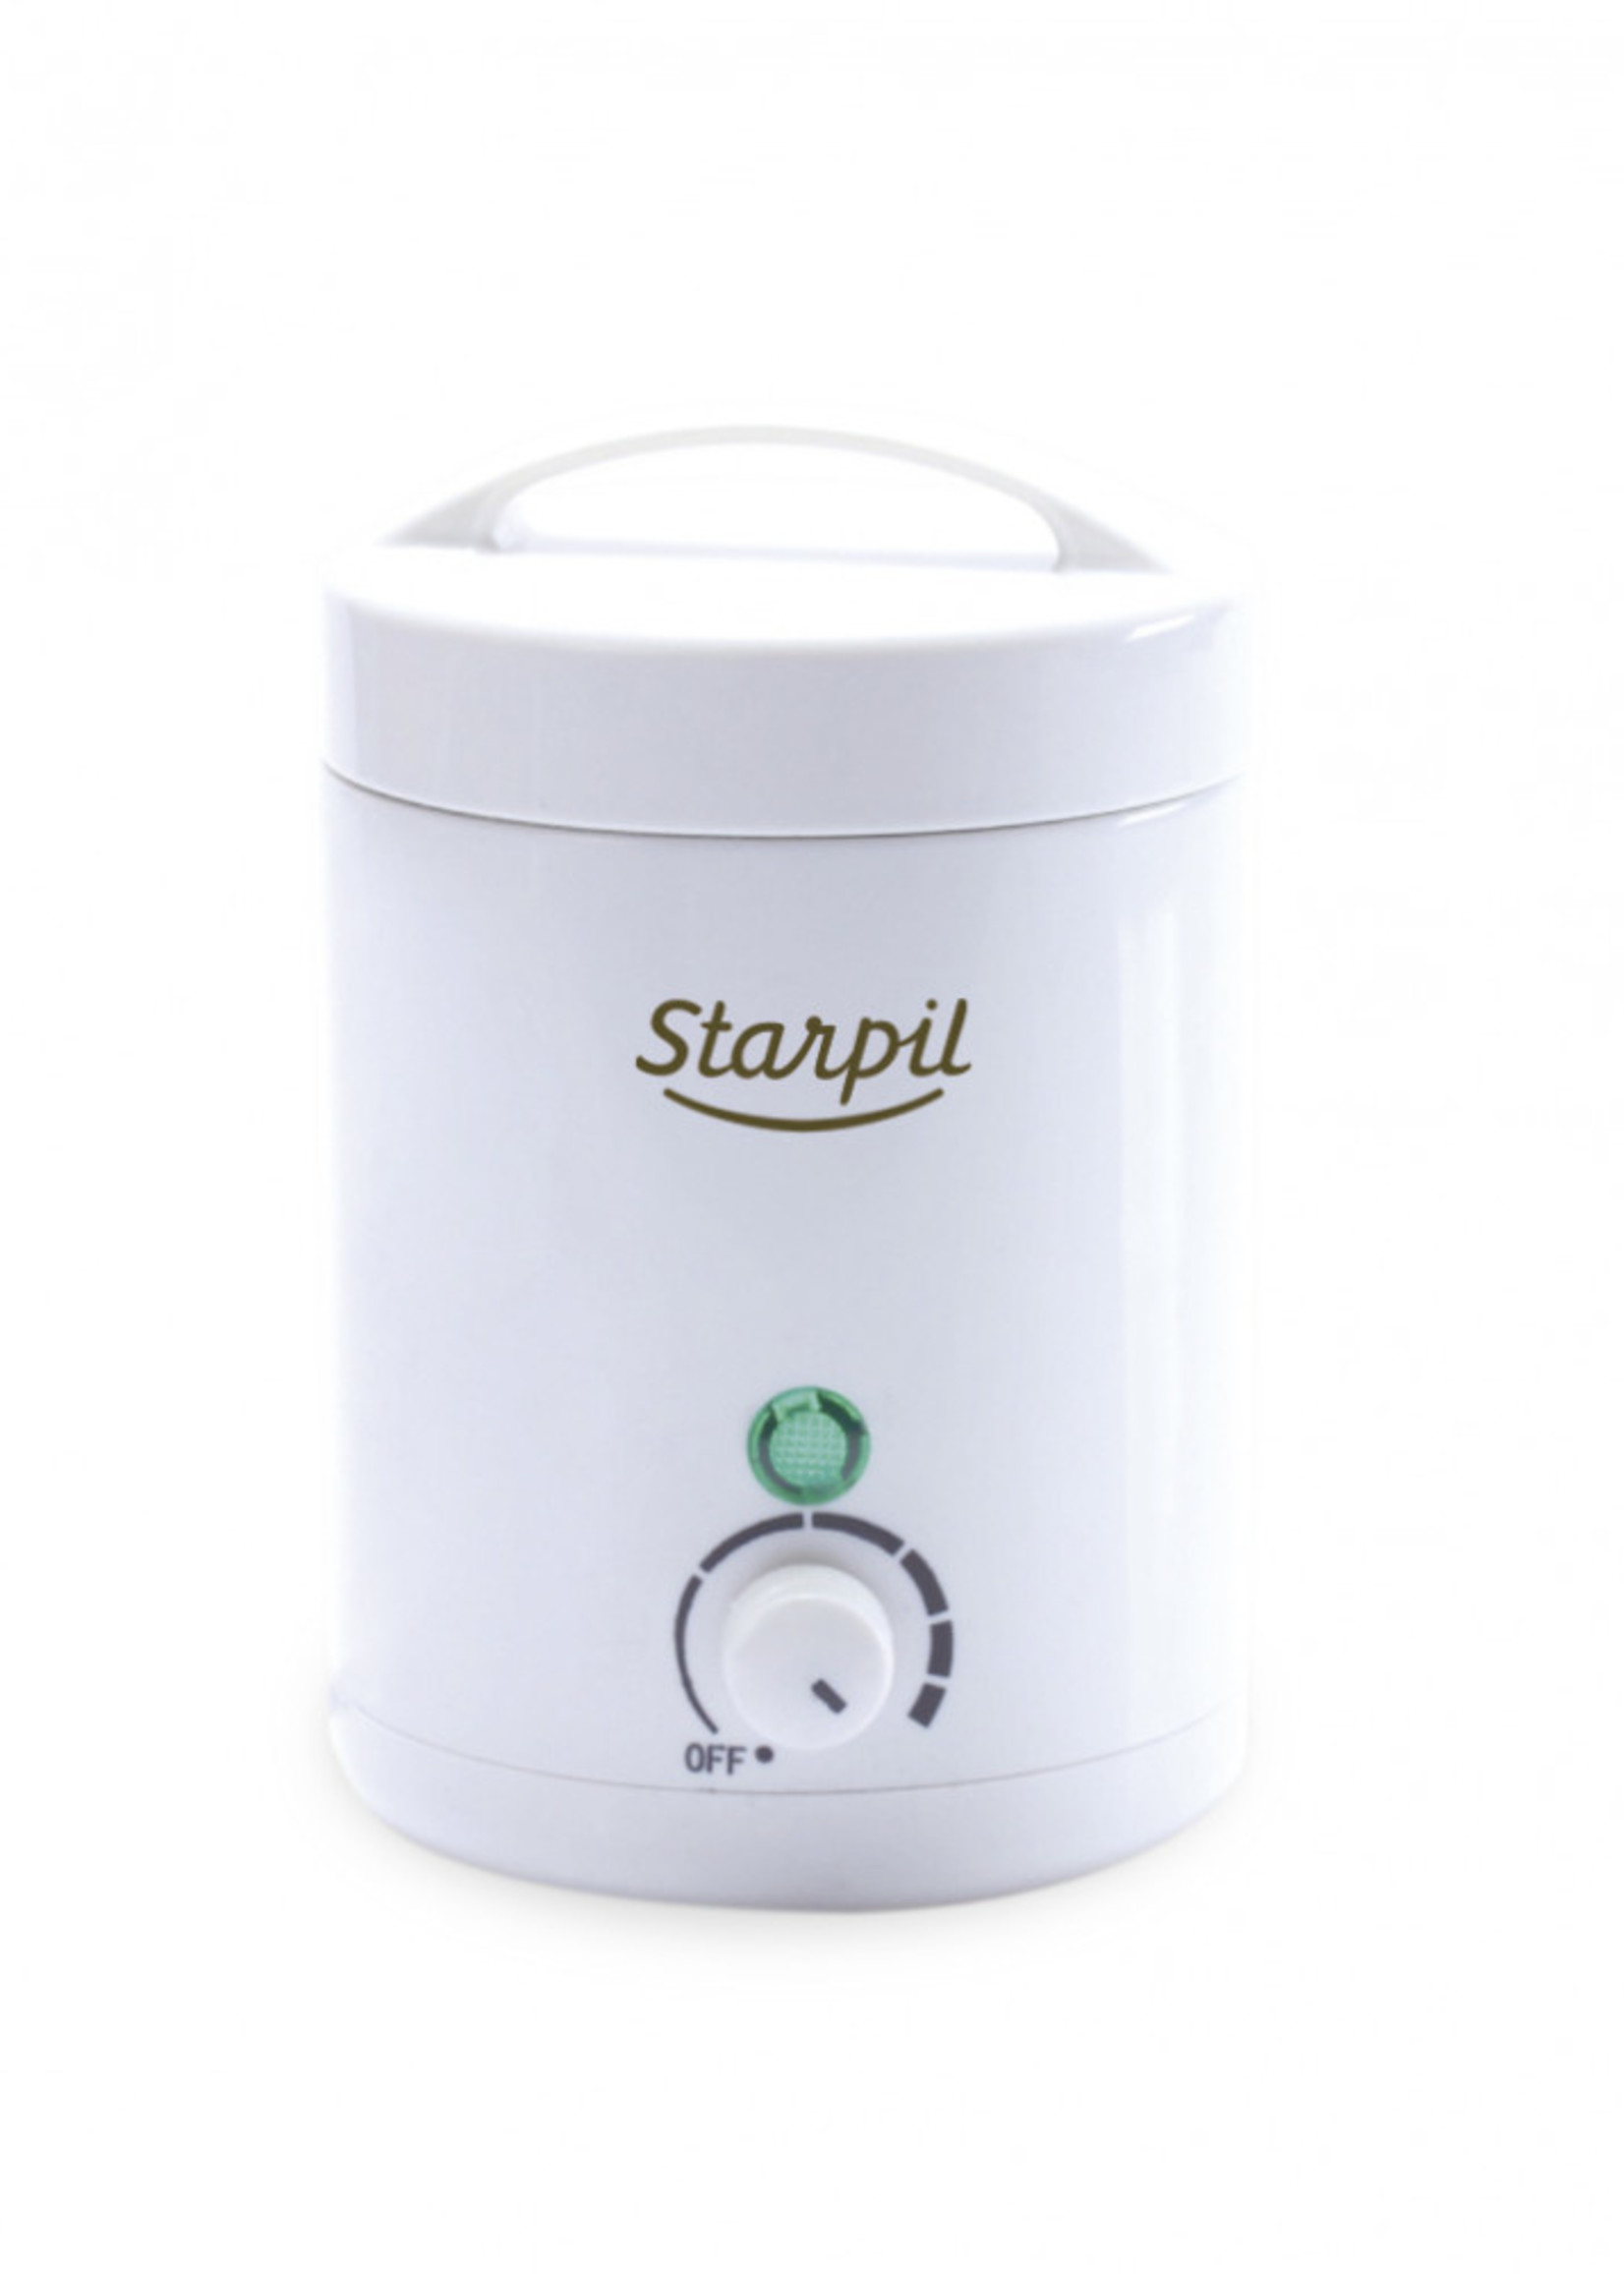 Starpil Profi Wachswärmer wachs erhitzer 200 ml